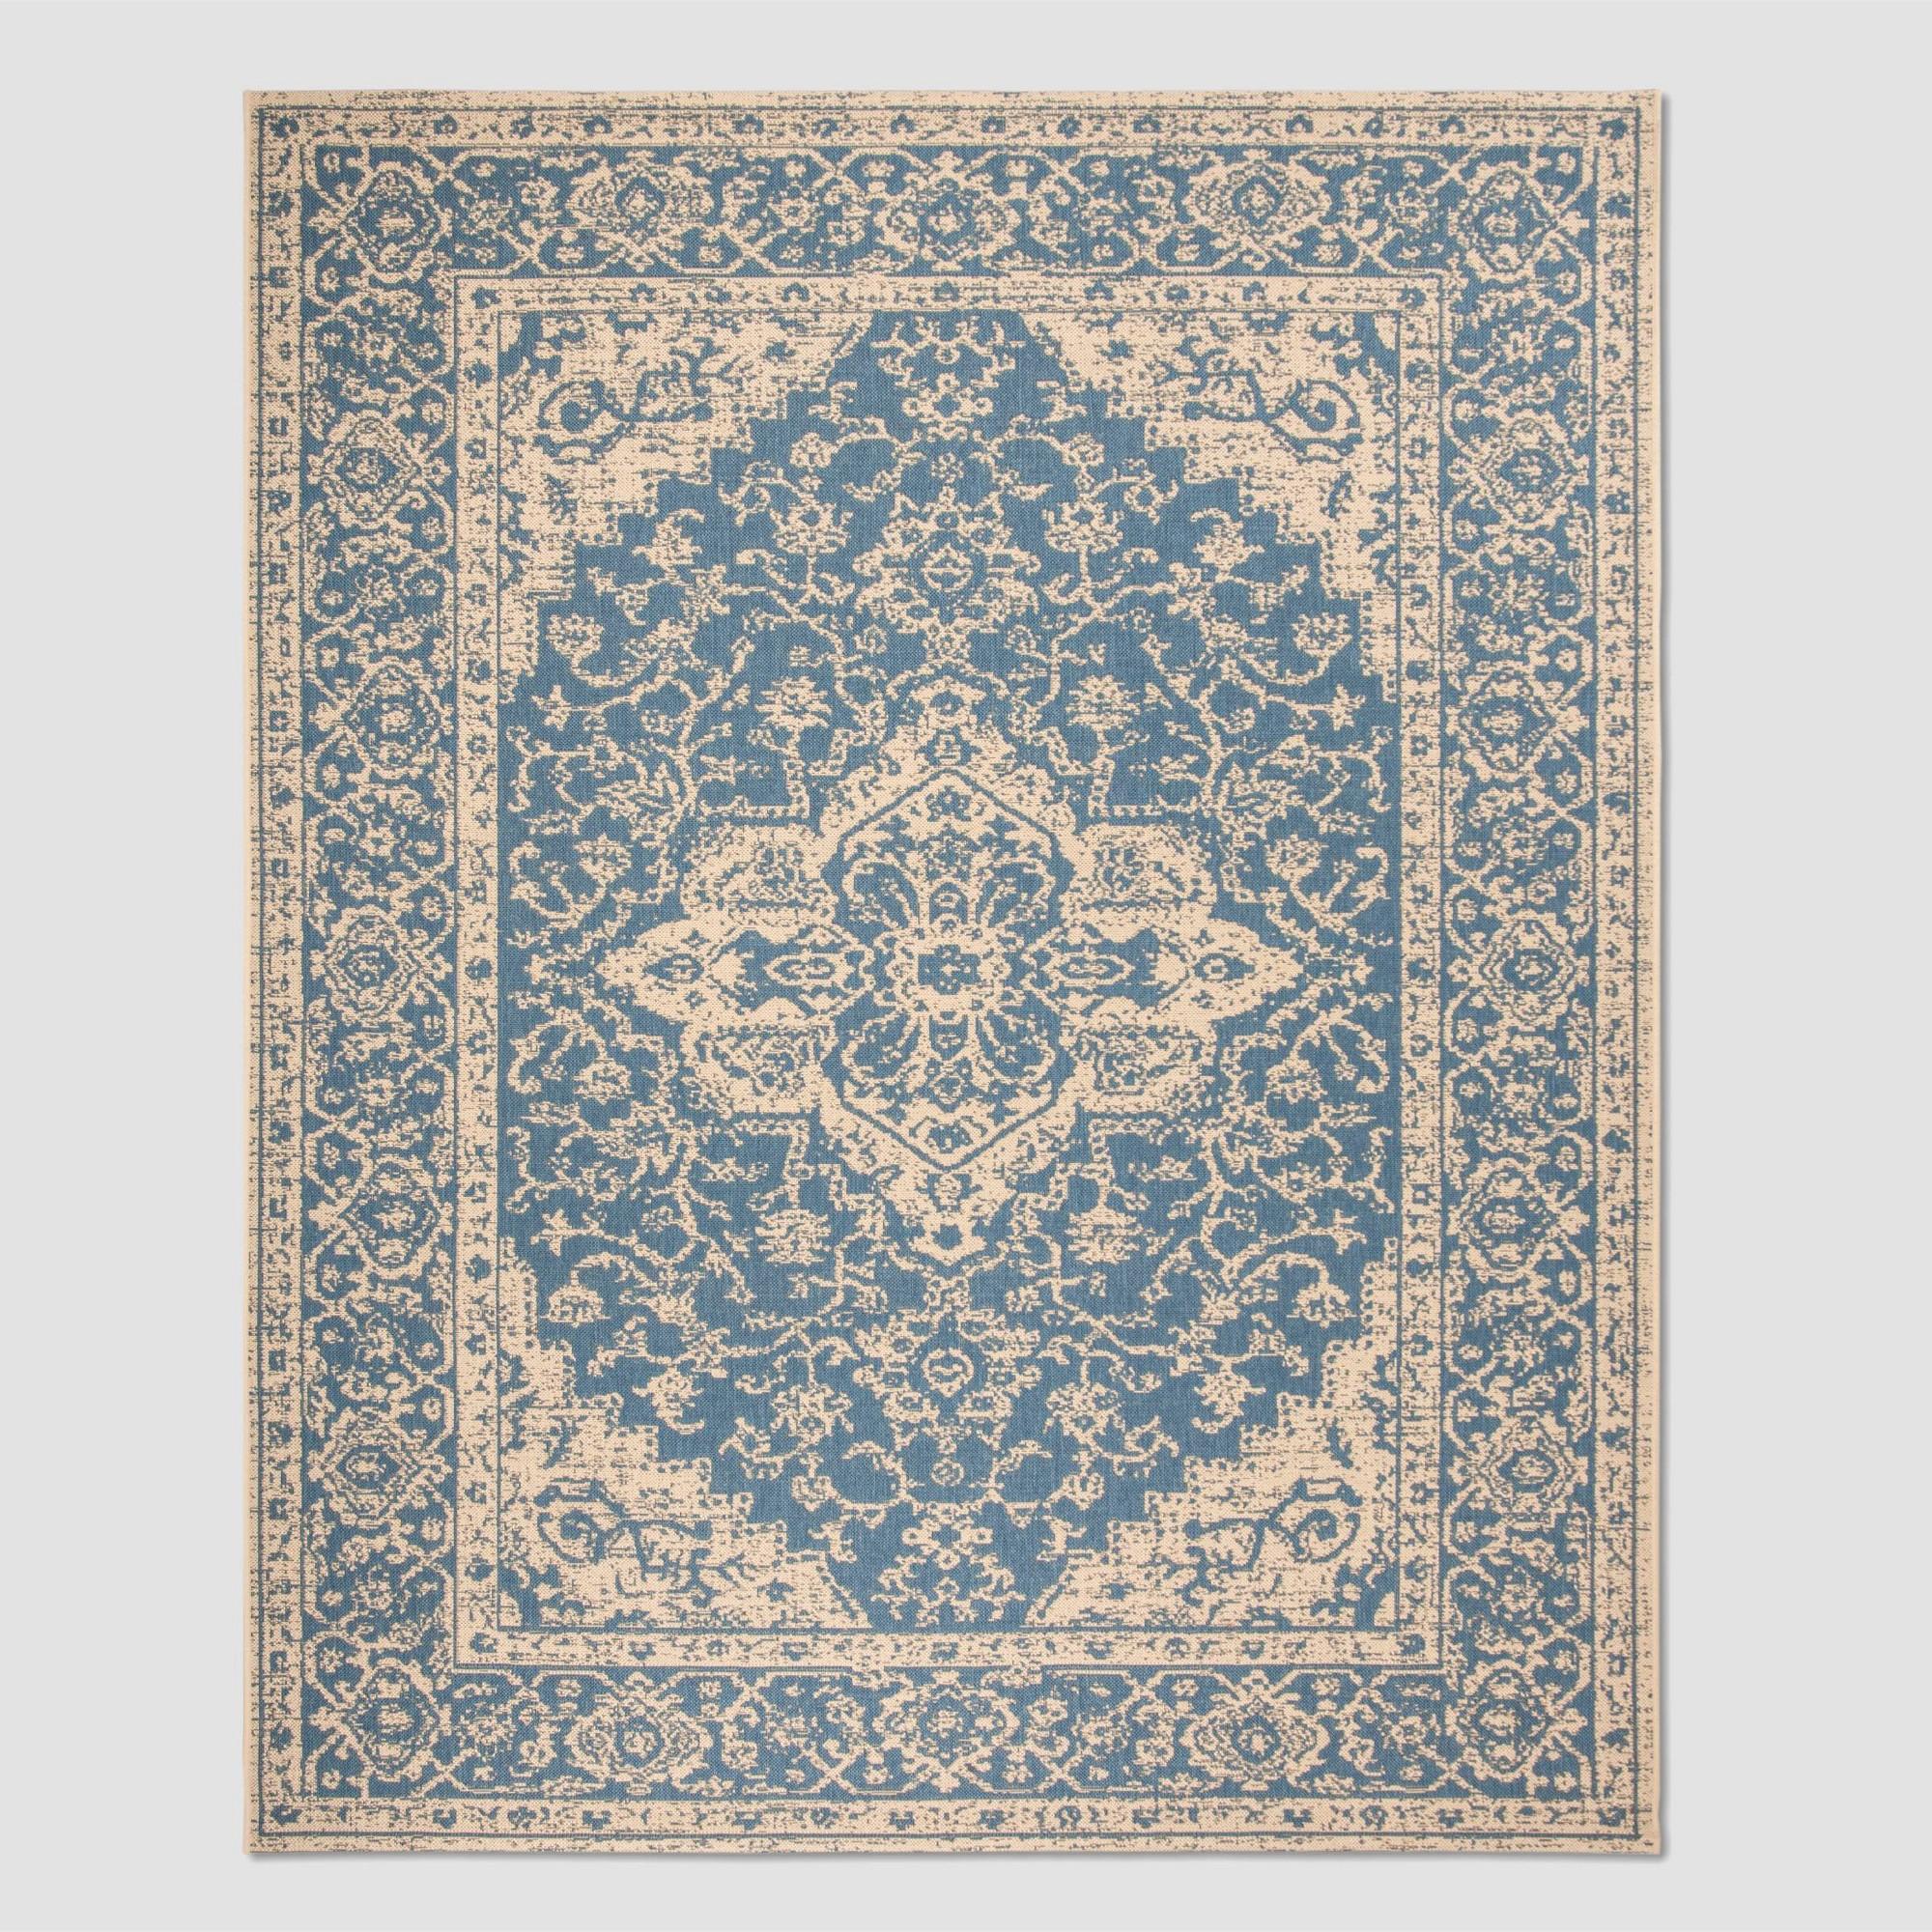 8'6 x 12' Kiley Outdoor Rug Blue/Cream - Safavieh, Blue Off-White